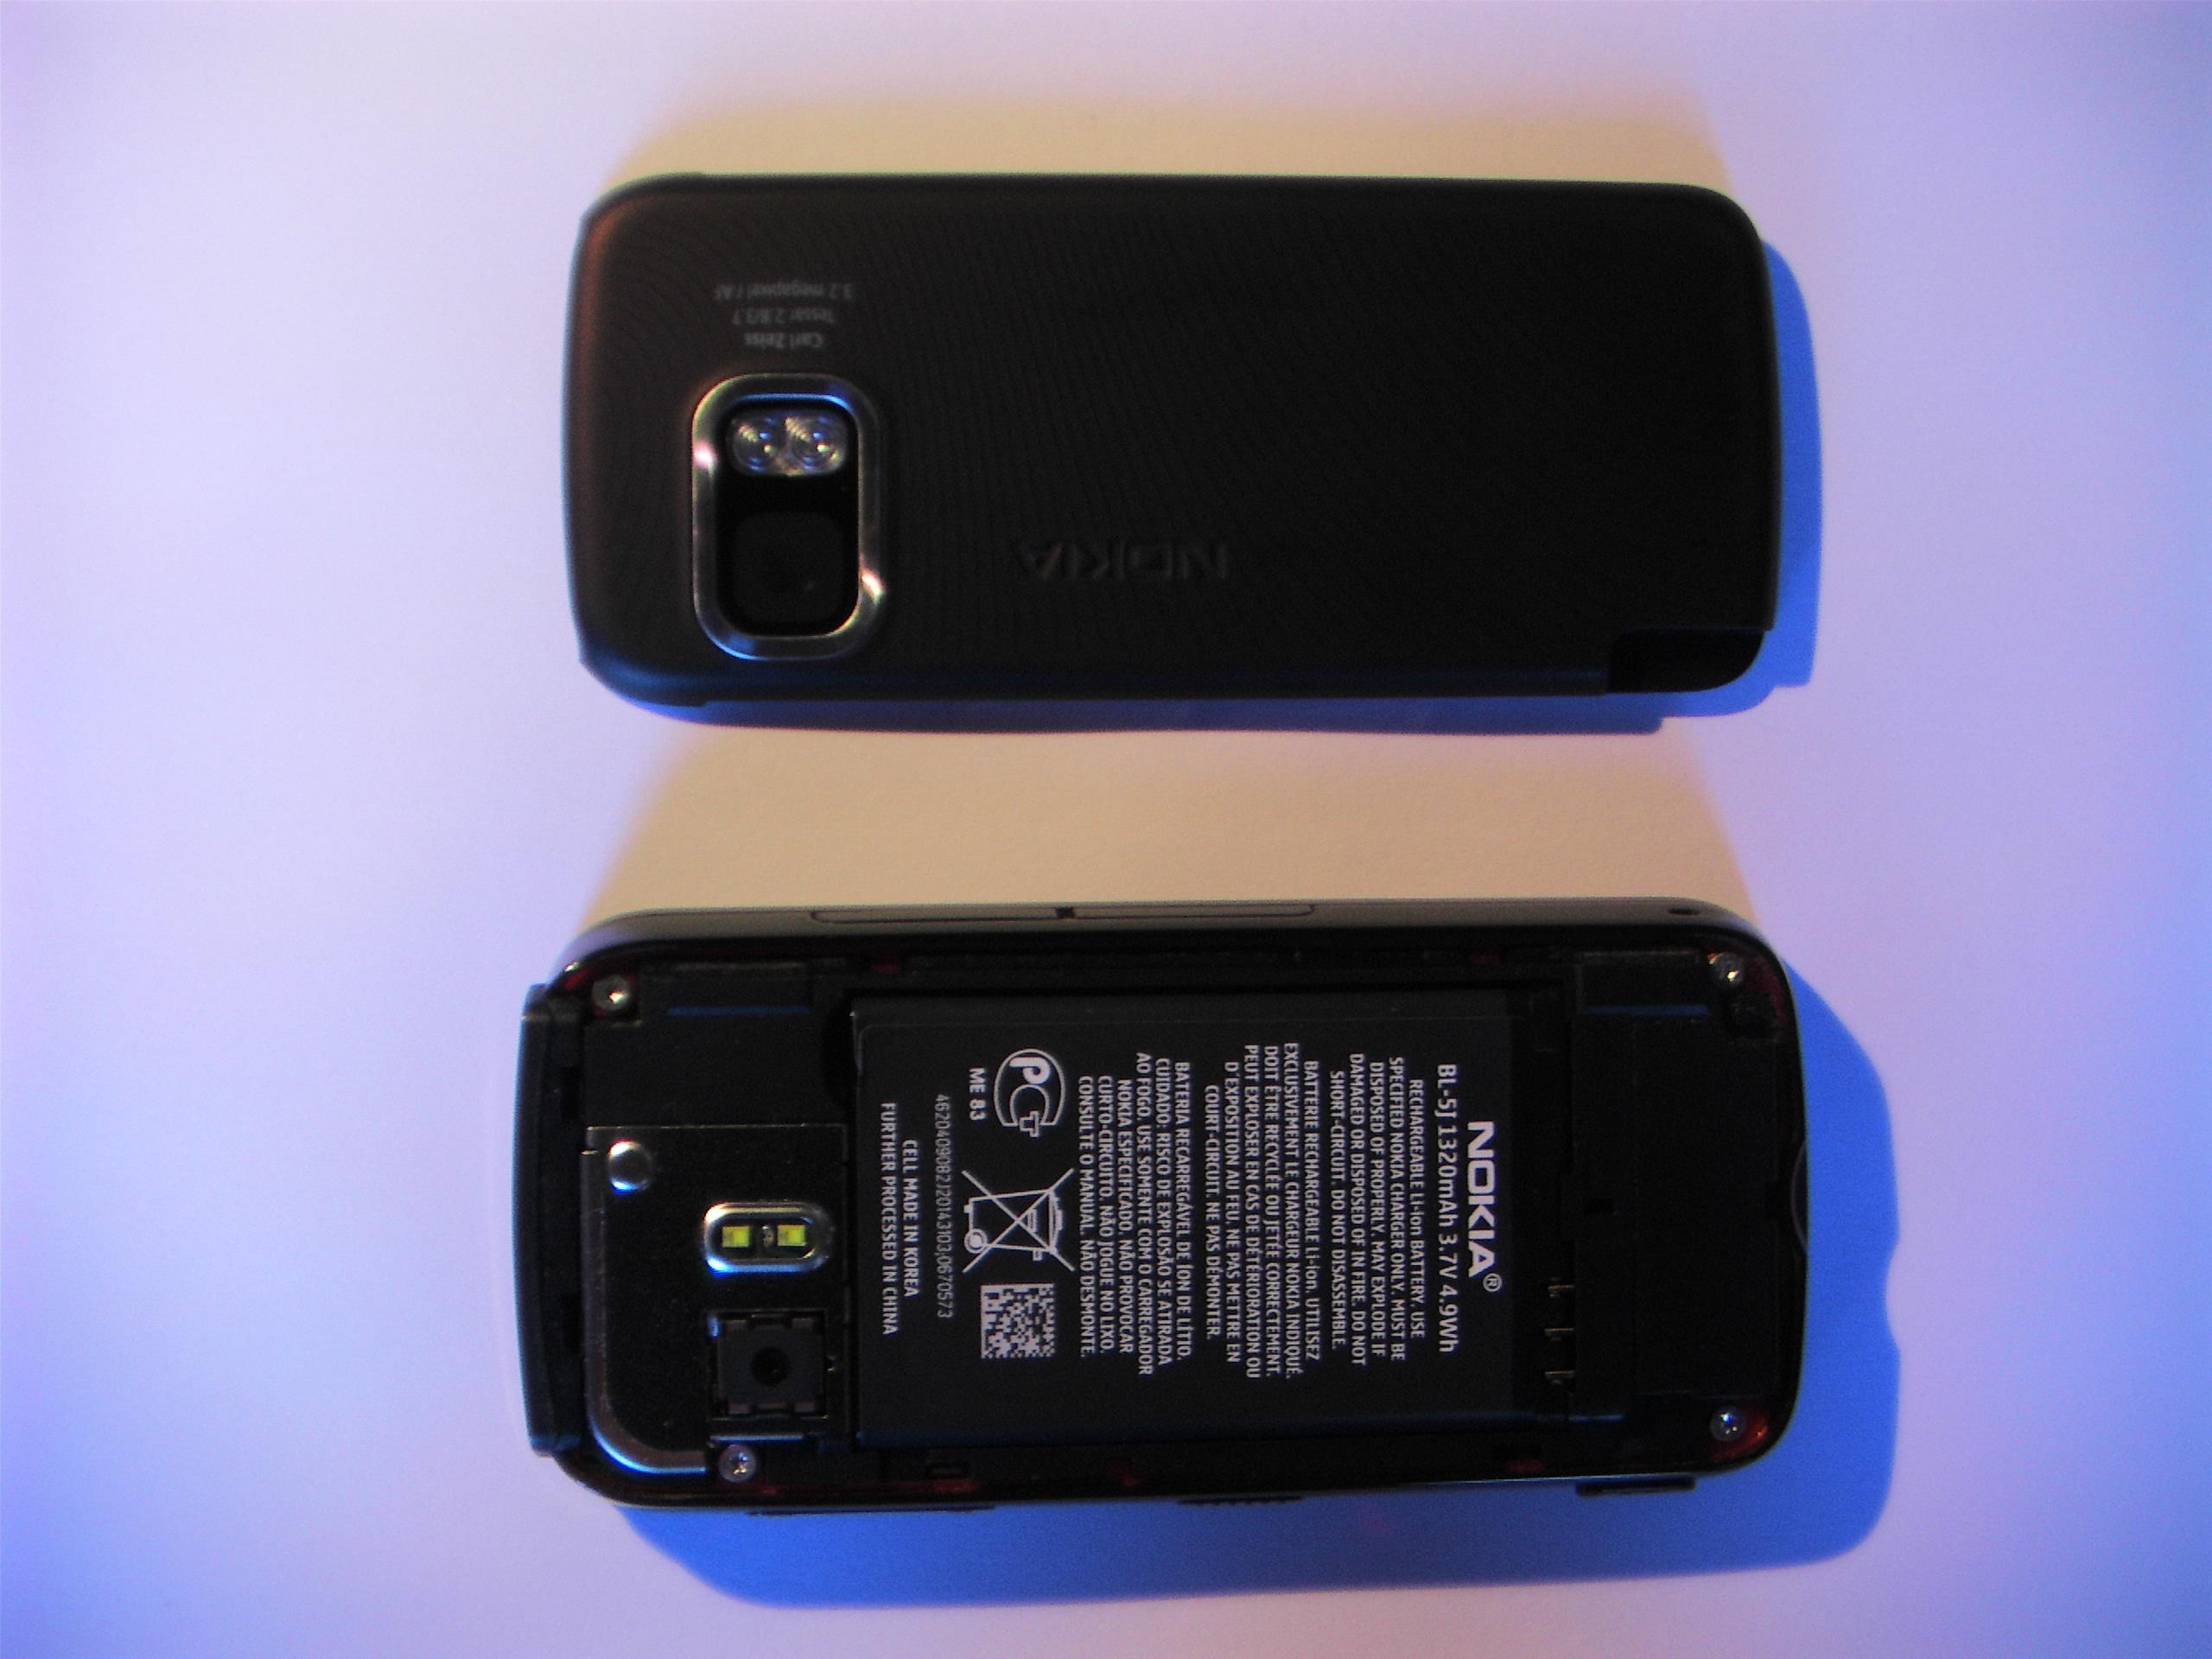 file interrieur du nokia 5800 xpressmusic avec baterrie jpg rh commons wikimedia org Nokia X6 Nokia N97 Mini